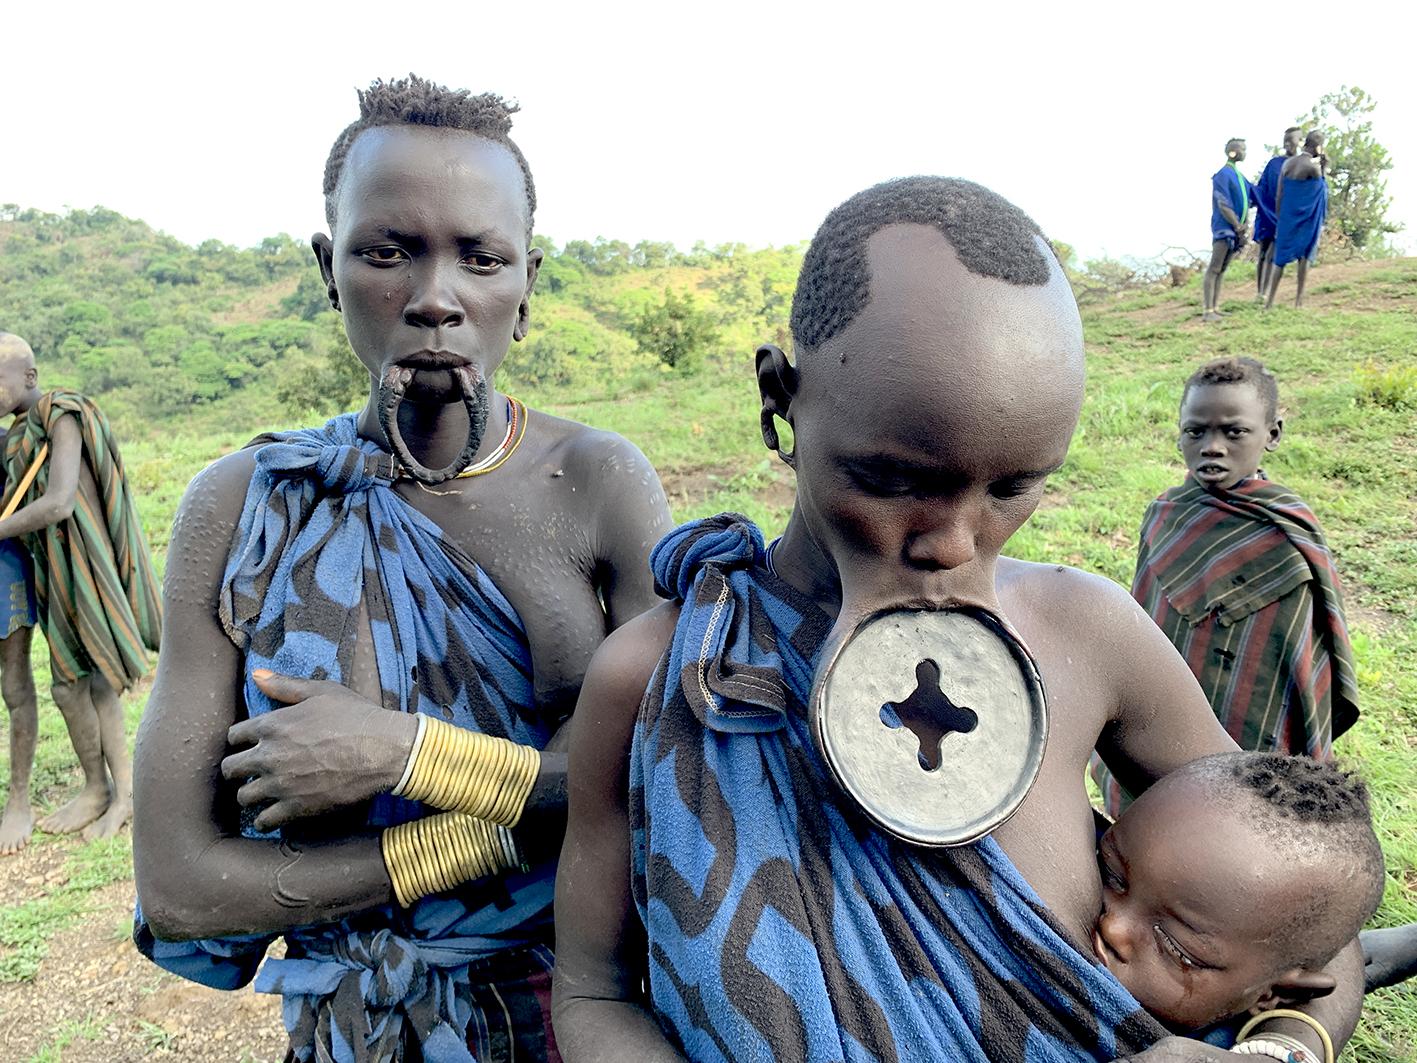 Mursi people, Omo Valley, Ethiopia